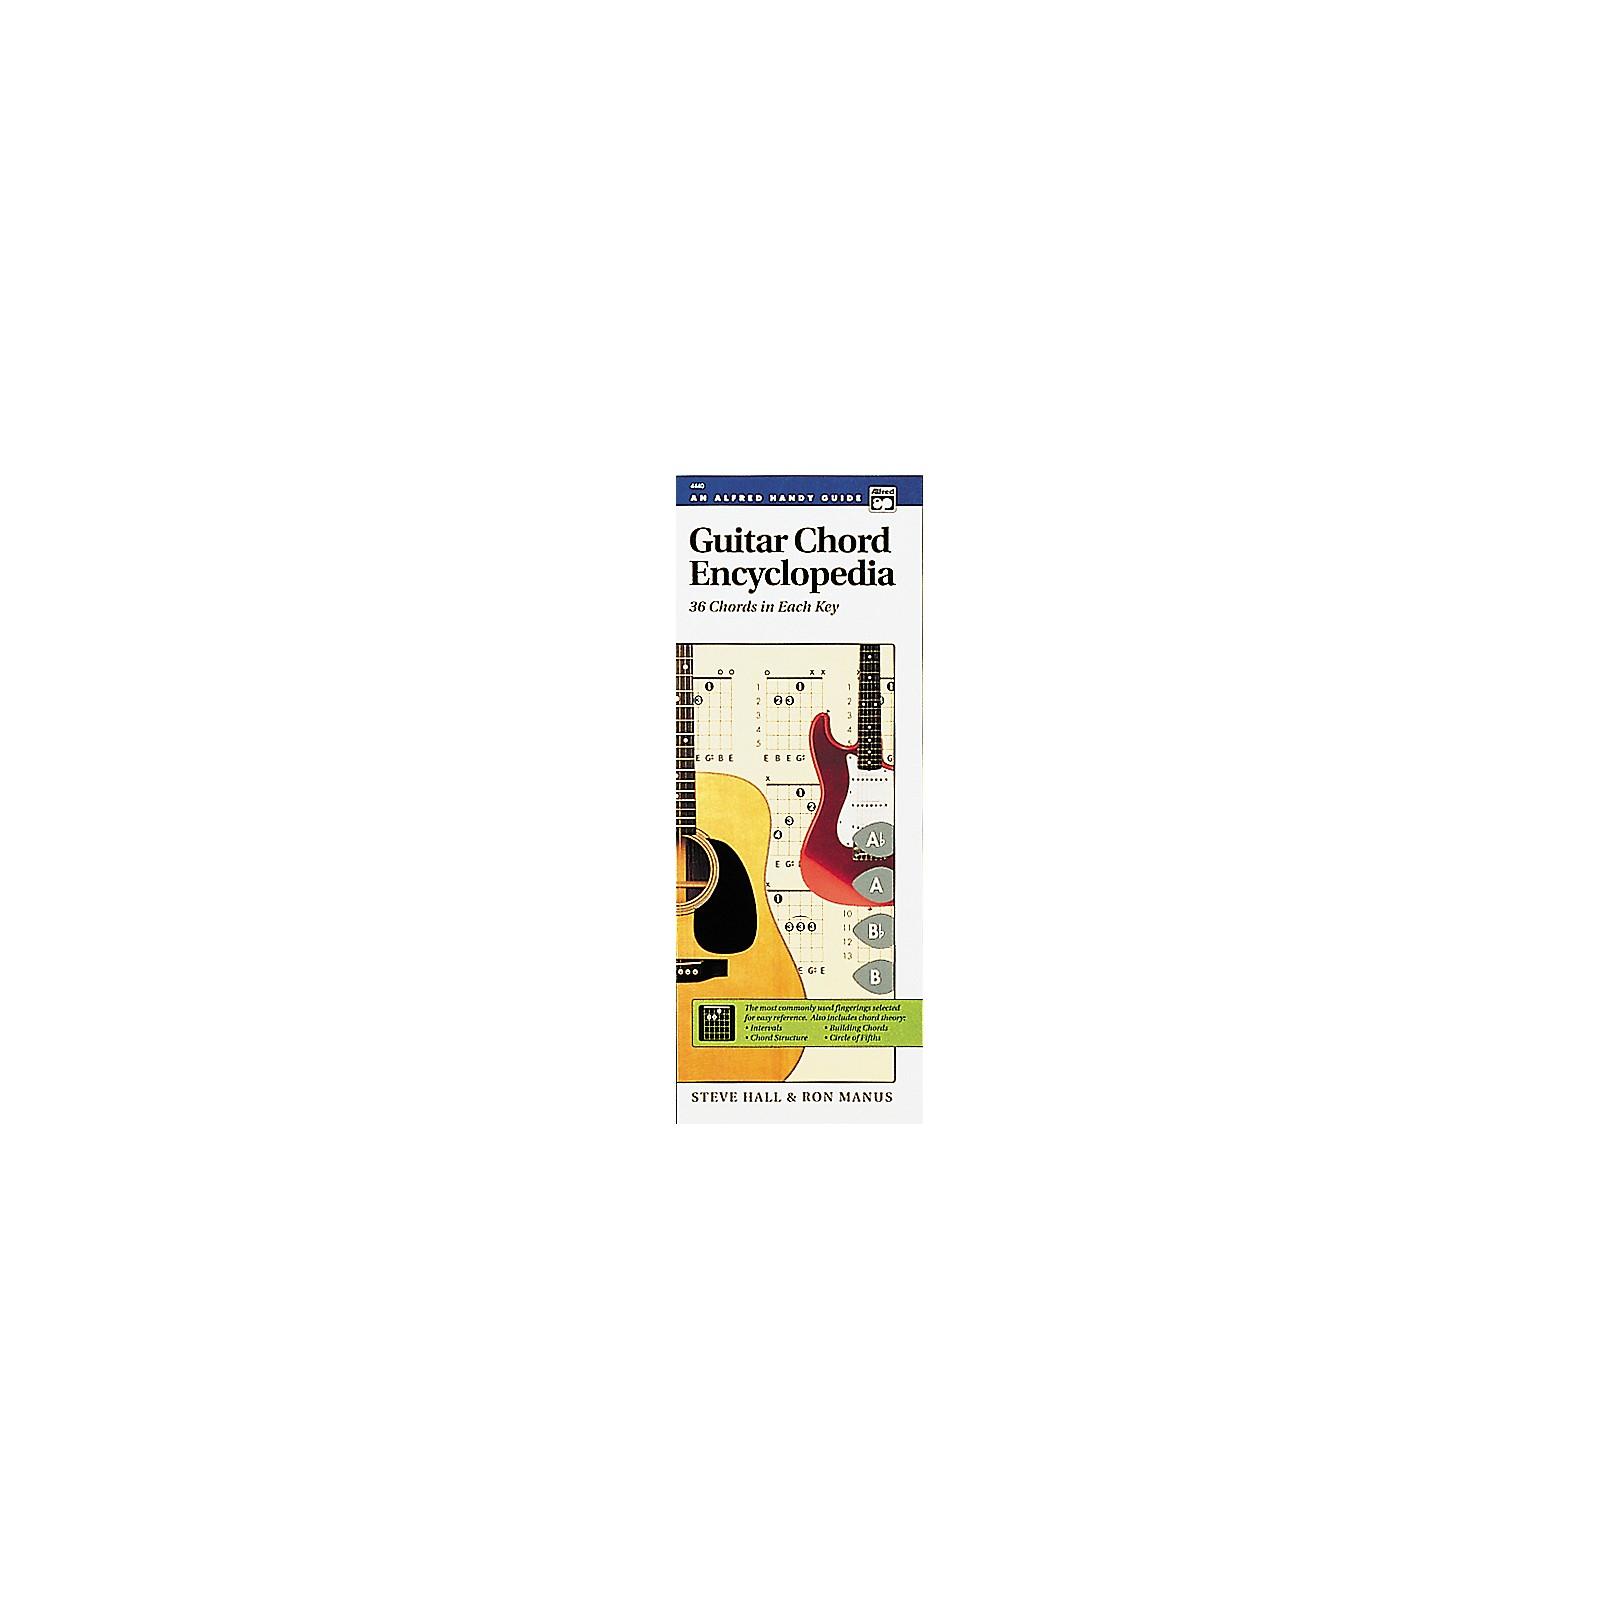 Alfred Guide Guitar Chord Encyclopedia Book